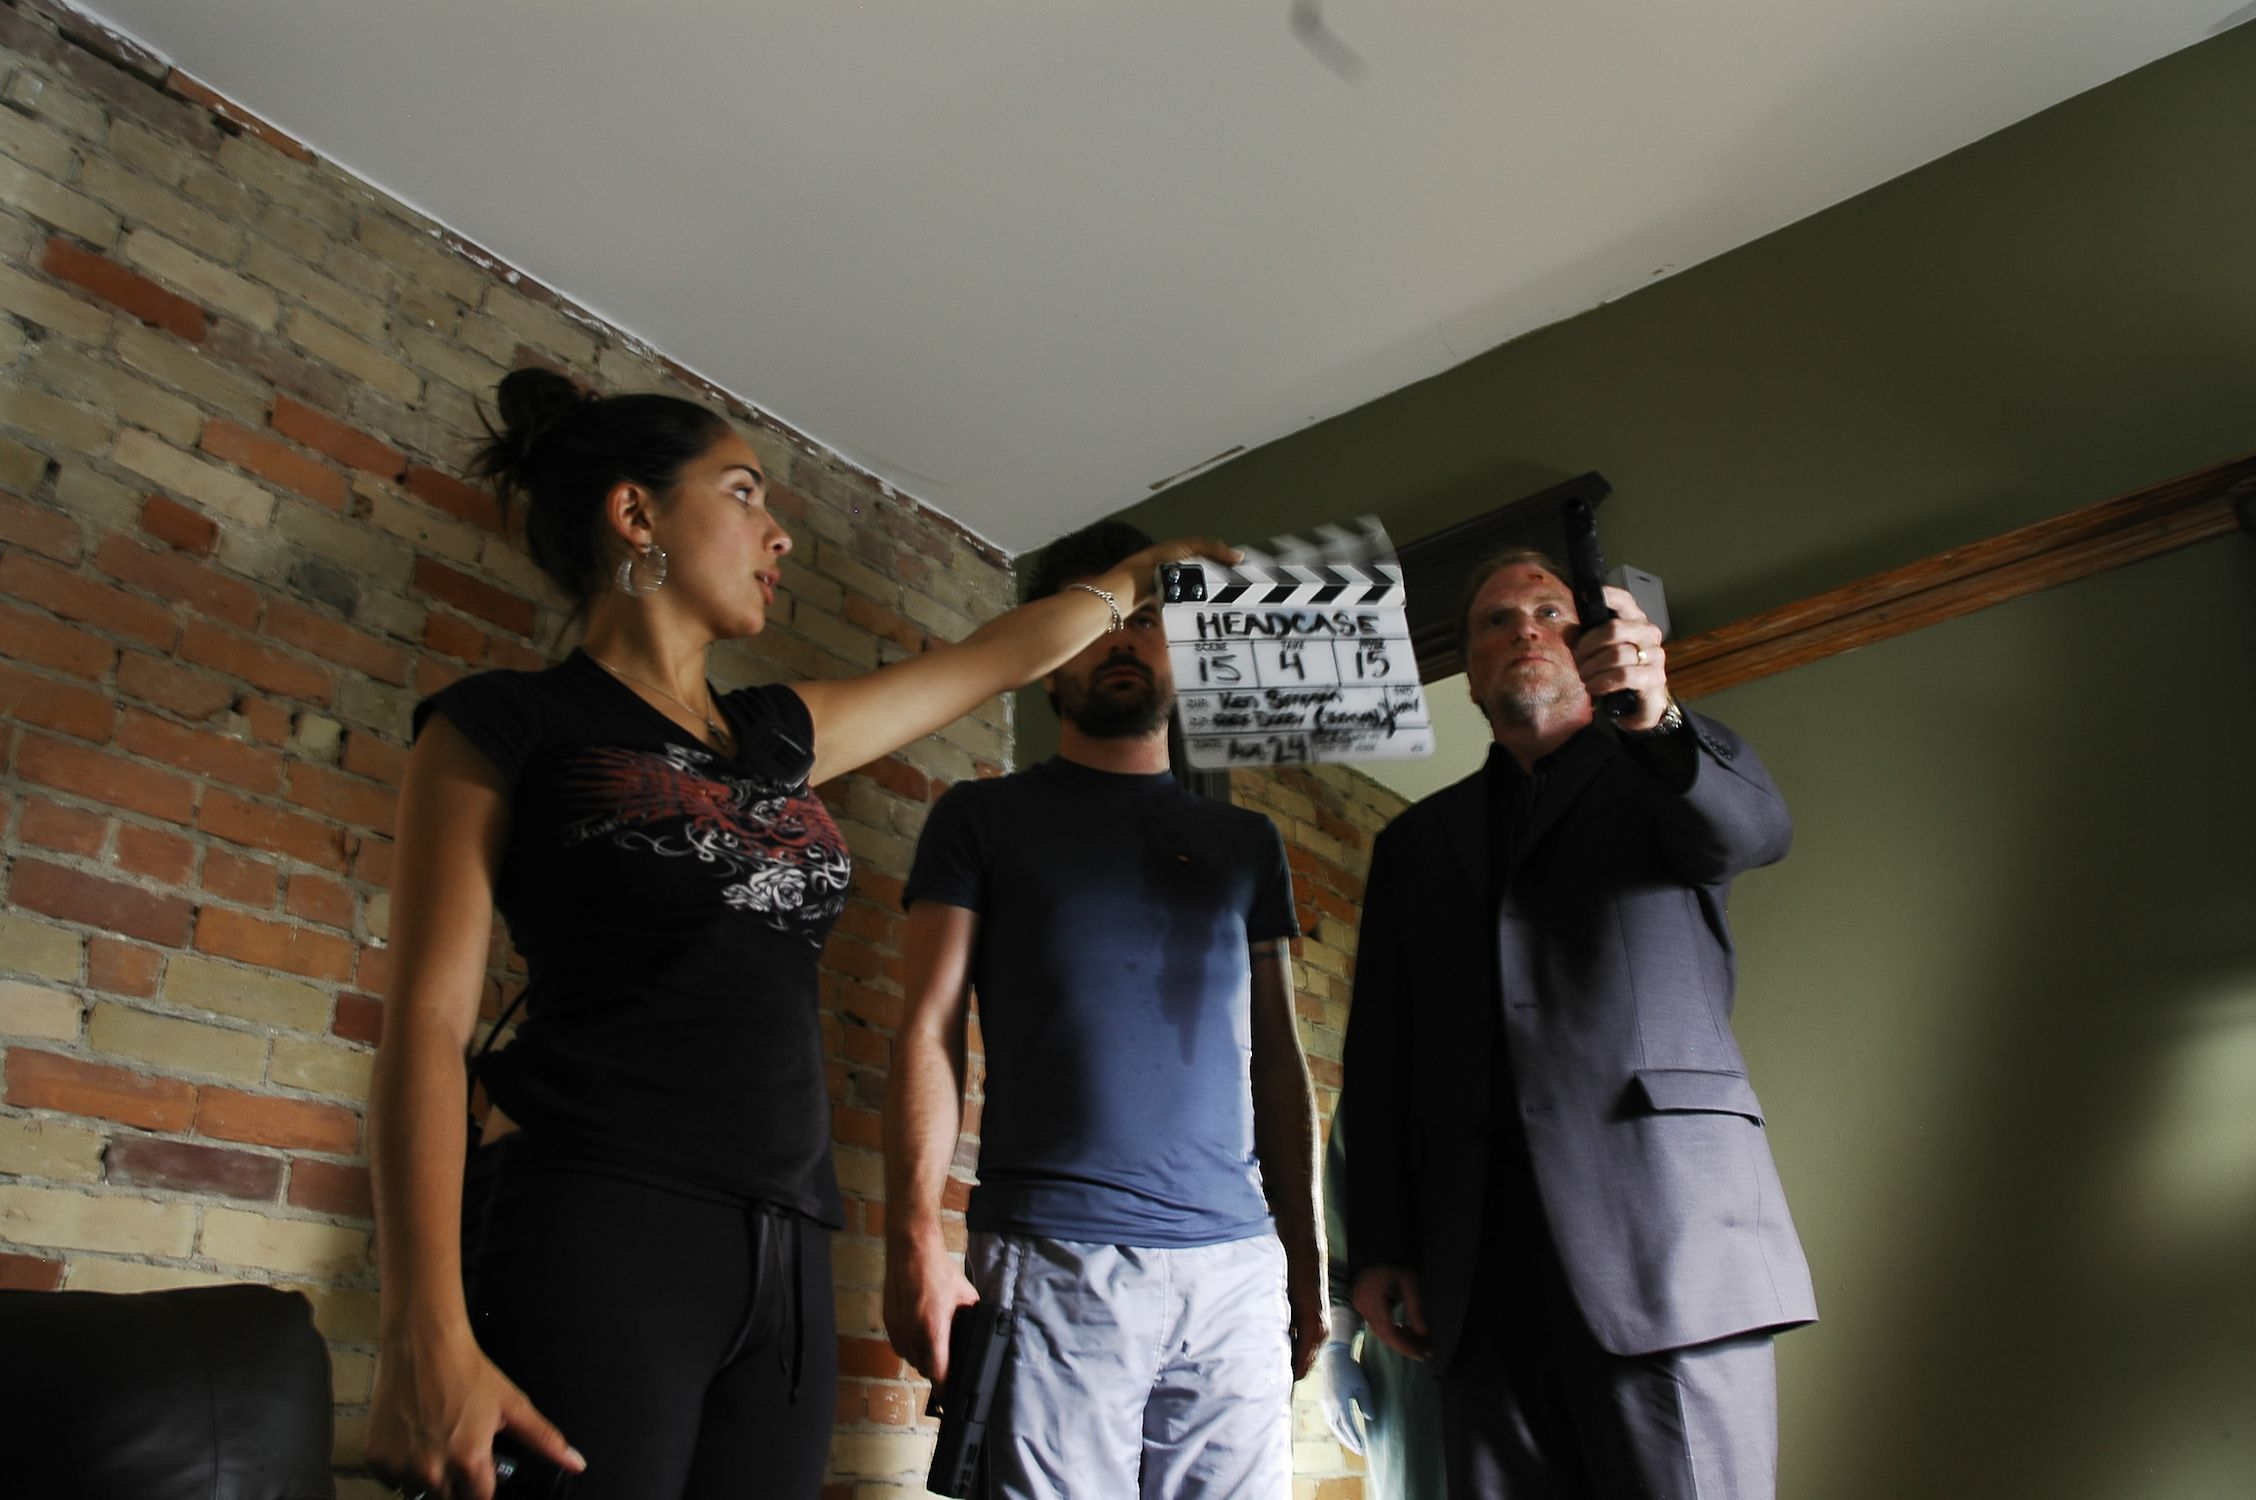 Co-producer Lara Amersey slates for Isaac Visaretis & Brian Scott